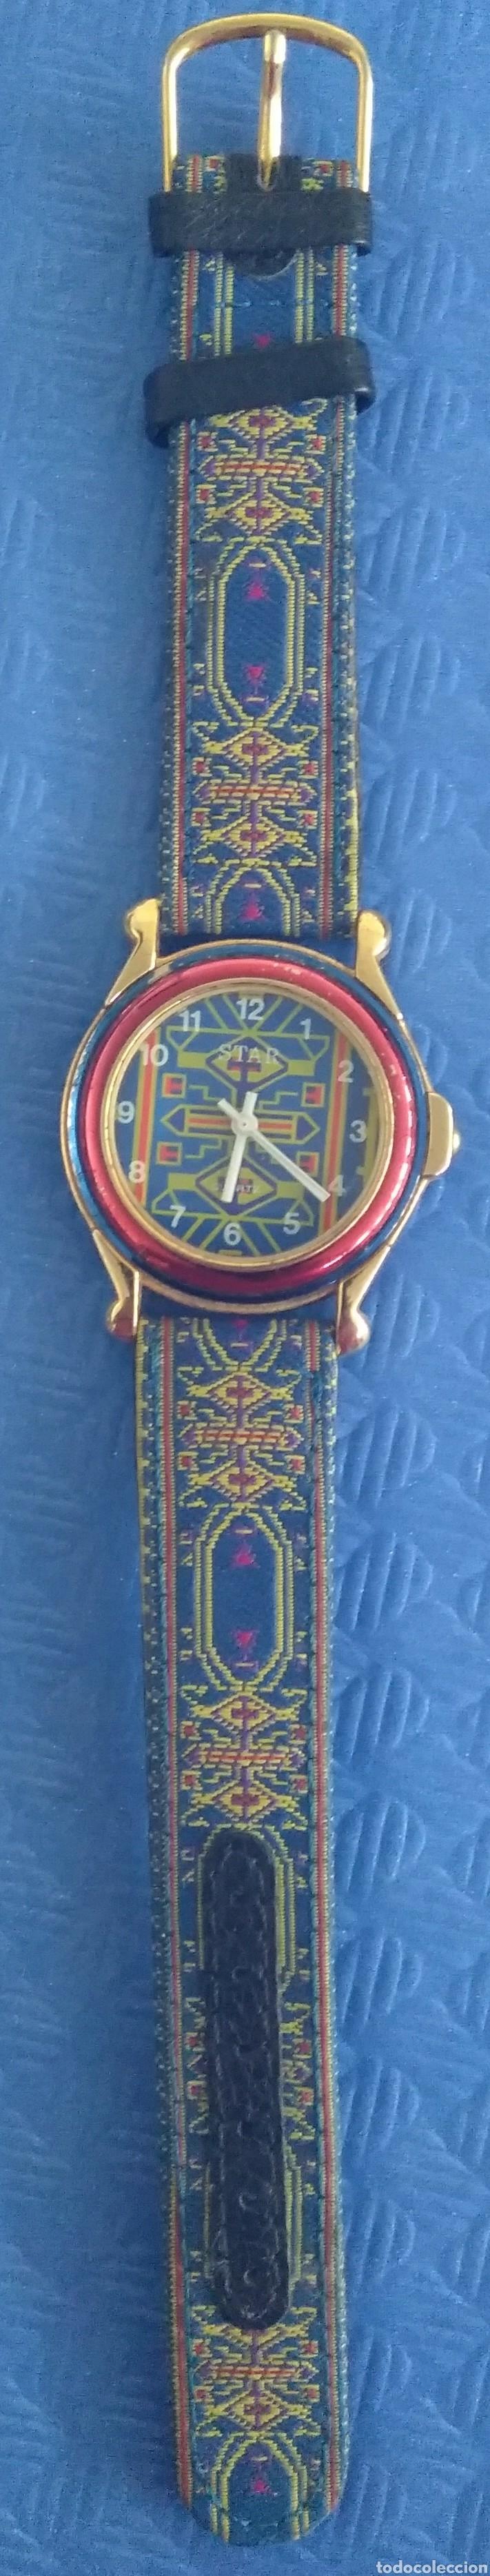 Relojes: Reloj unisex Star - Foto 2 - 167925224